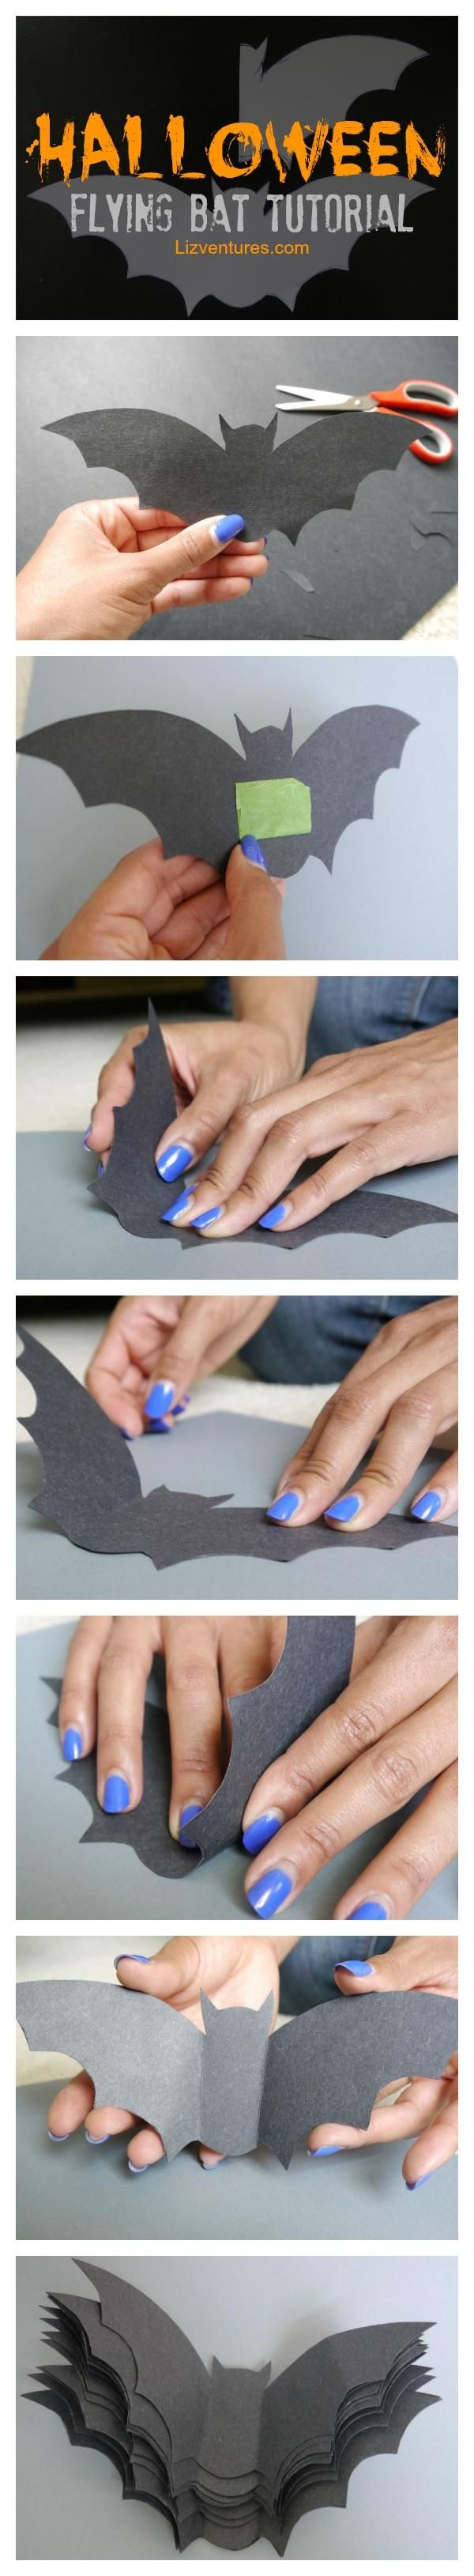 Flying Halloween Bats Tutorial + Free Printable!